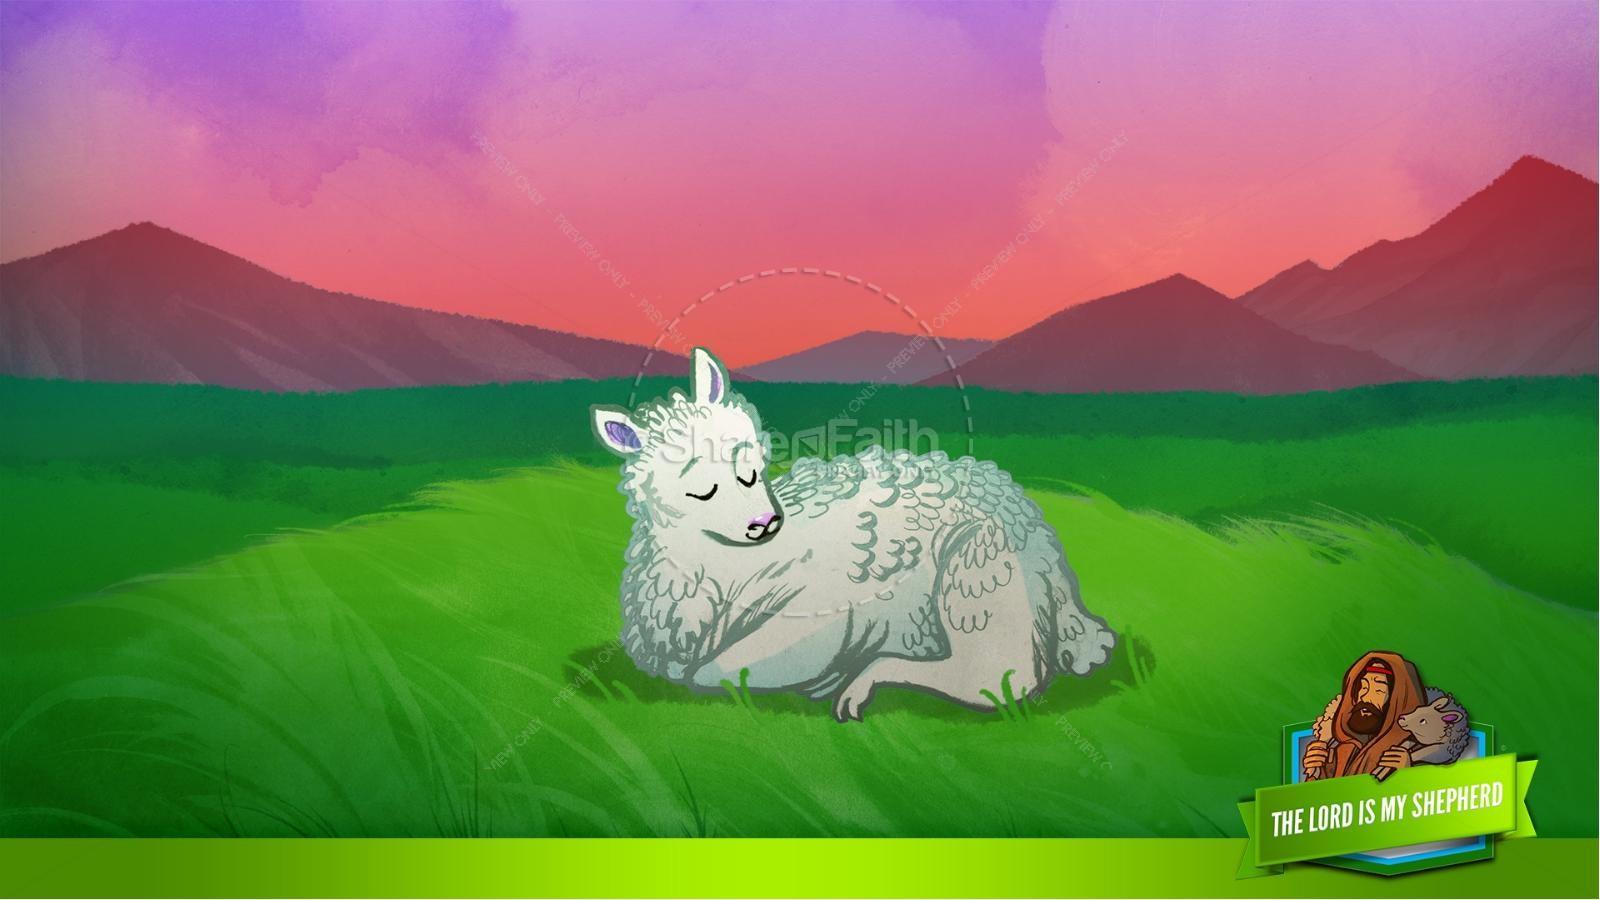 Psalm 23 The Lord Is My Shepherd Kids Bible Story | slide 14